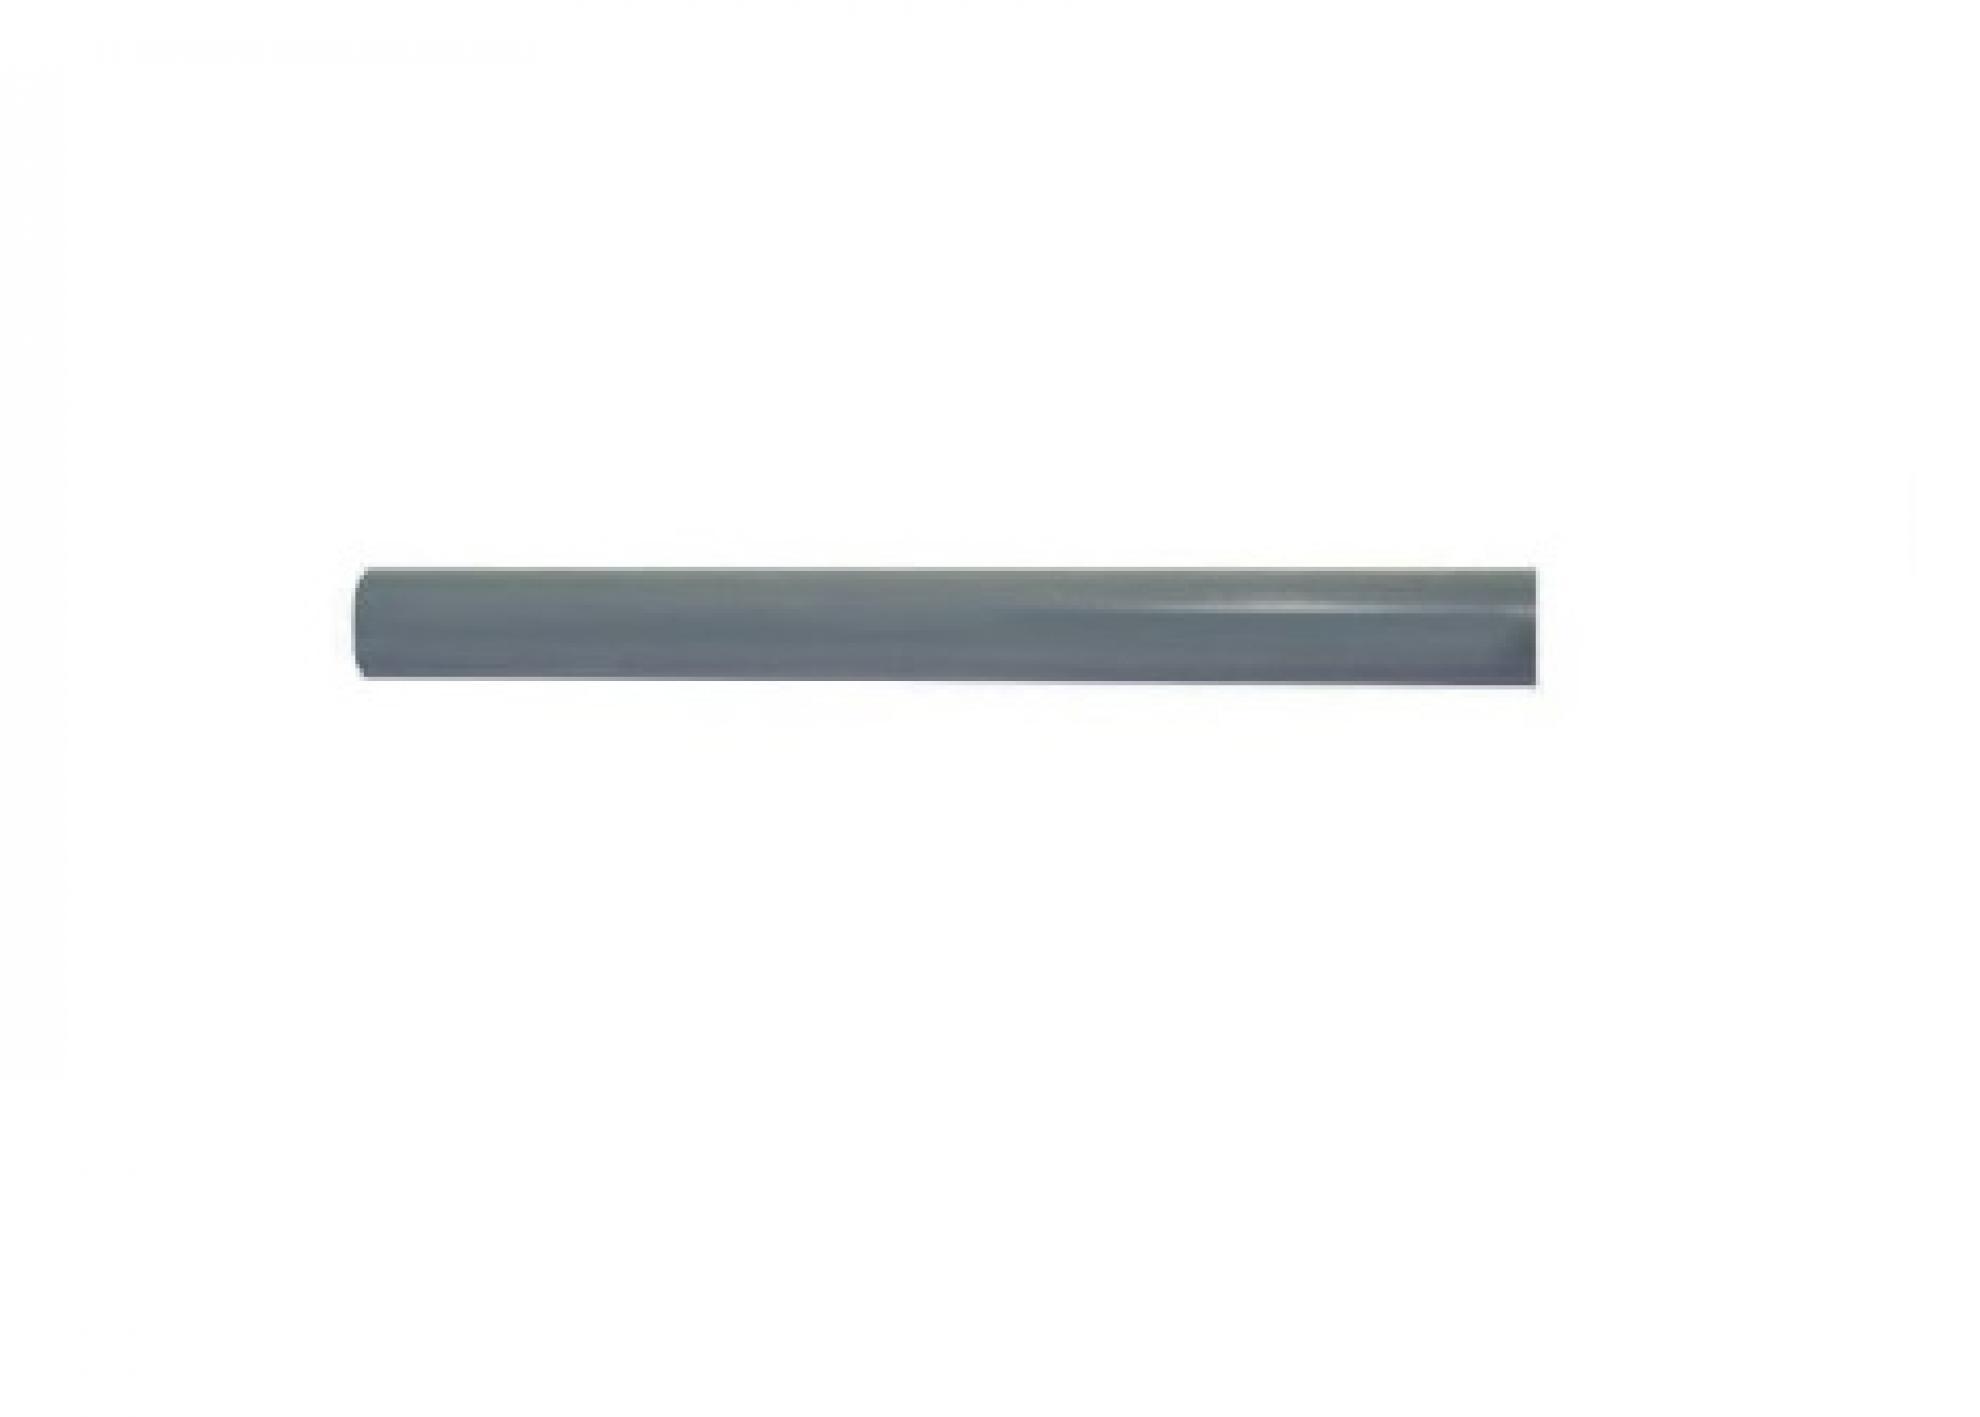 "Eletroduto PVC 1"" polegadas - Cinza"